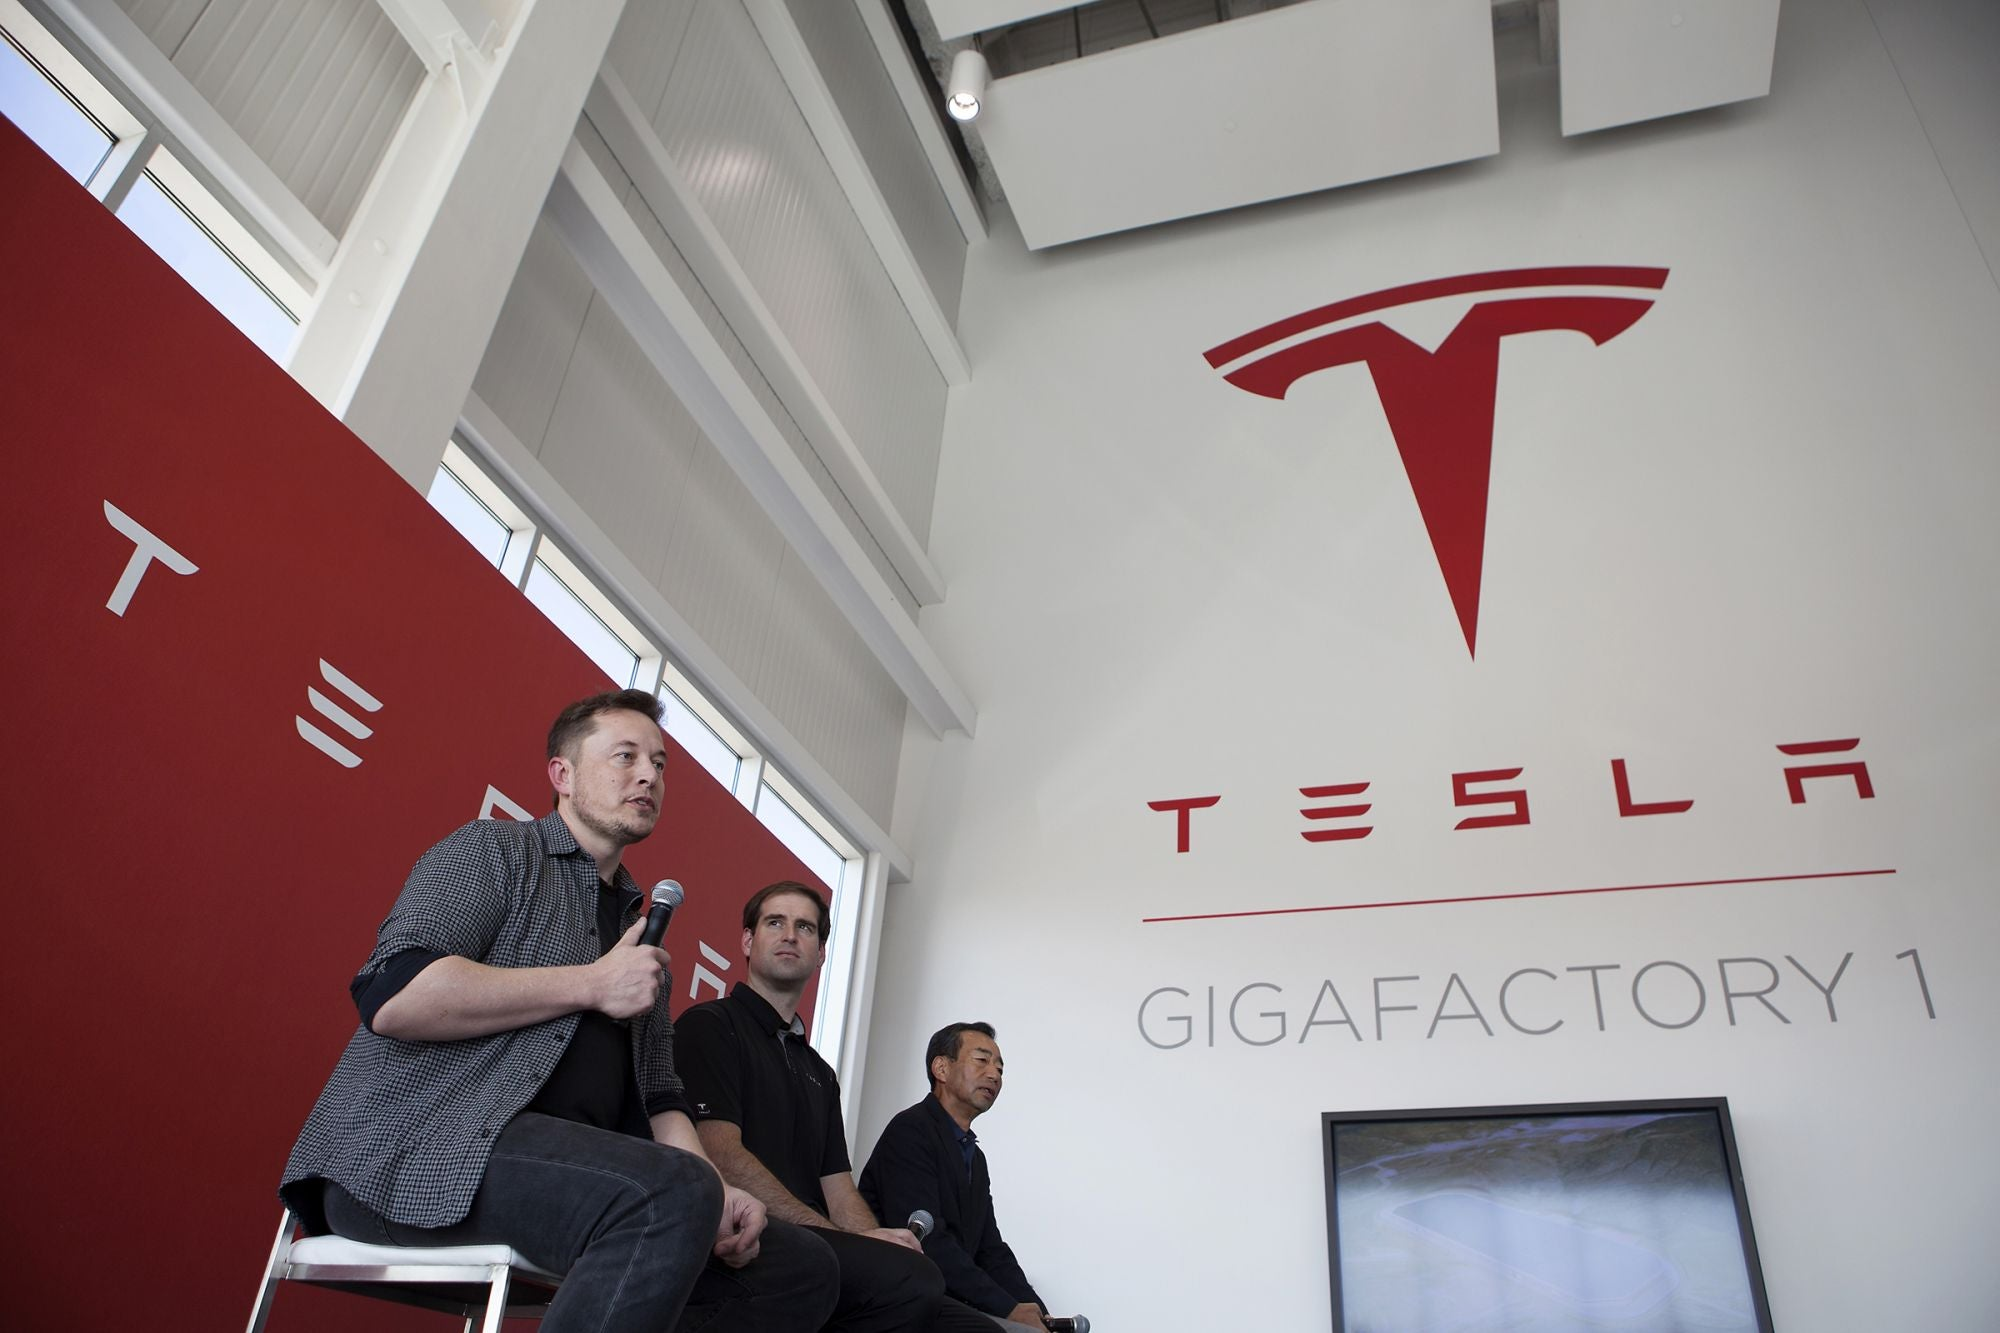 Tesla Shares Down After Gigafactory Expansion Put on Hold